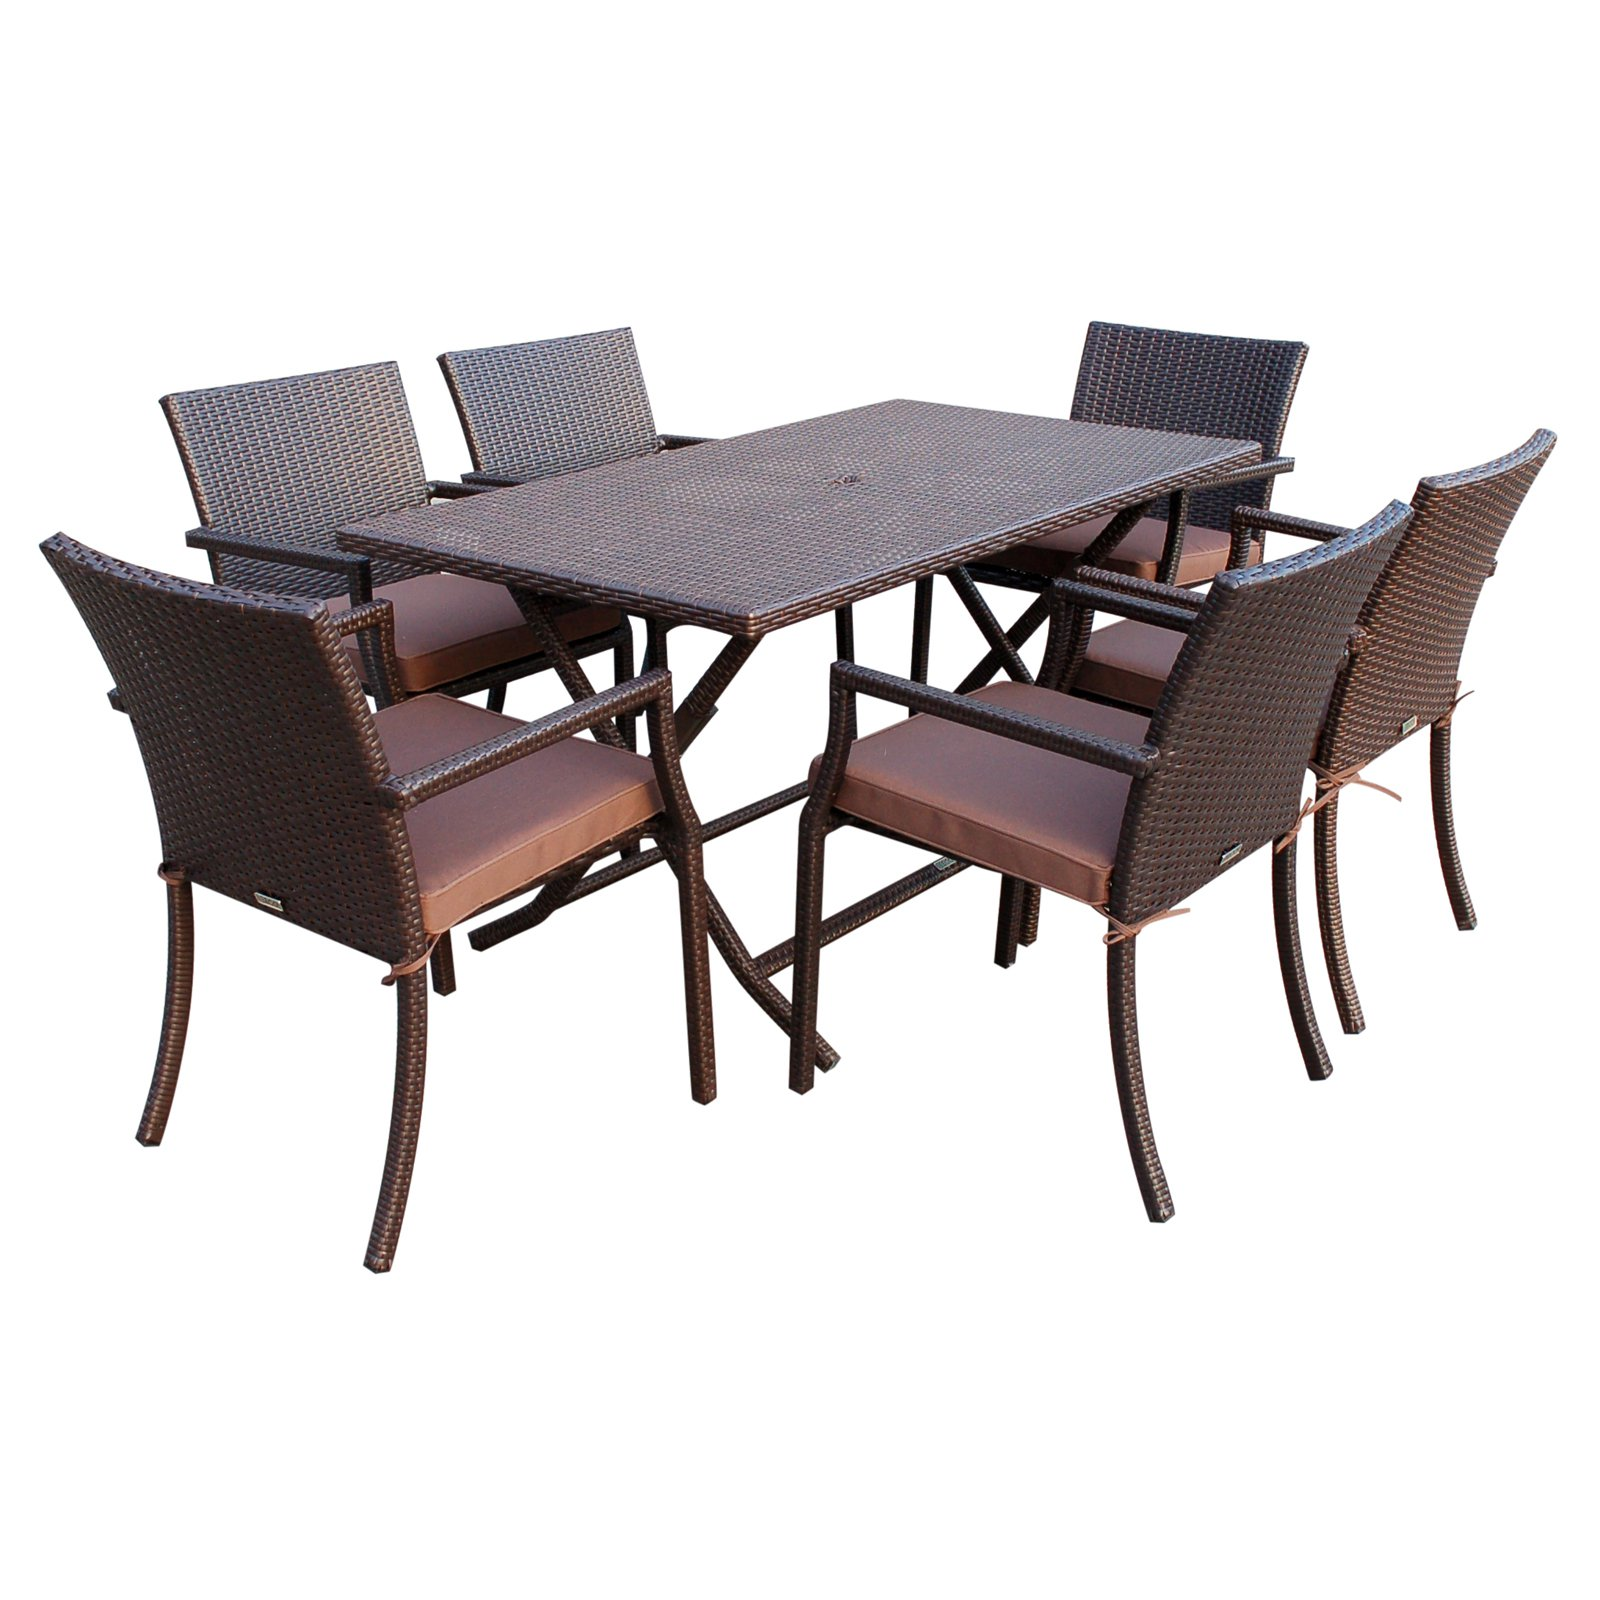 Jeco Cafe Wicker 7-Piece Rectangular Patio Dining Set